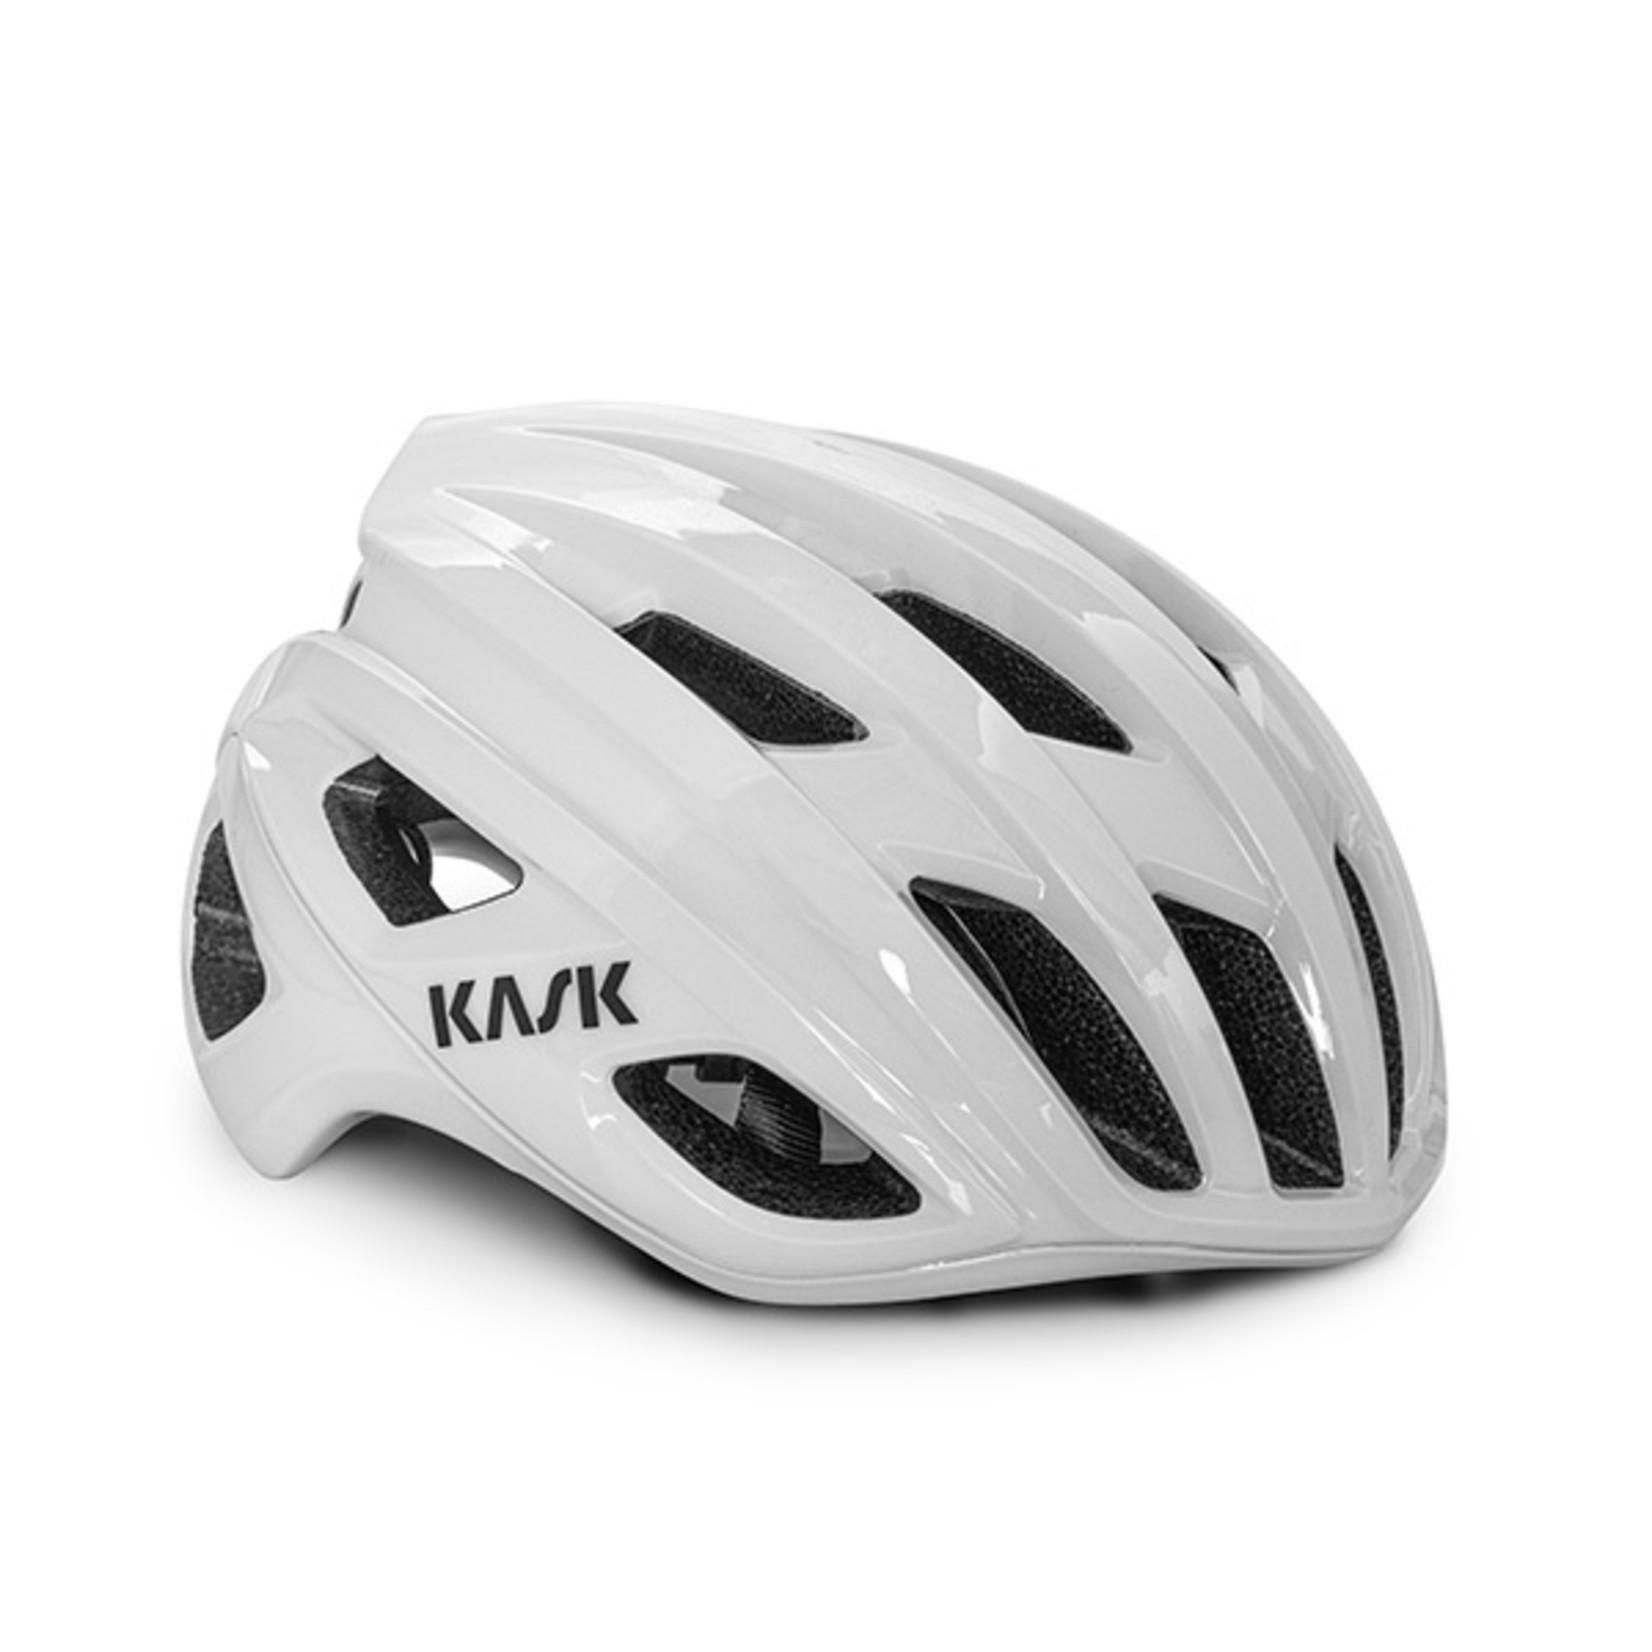 Kask Kask Mojito3 Helmet